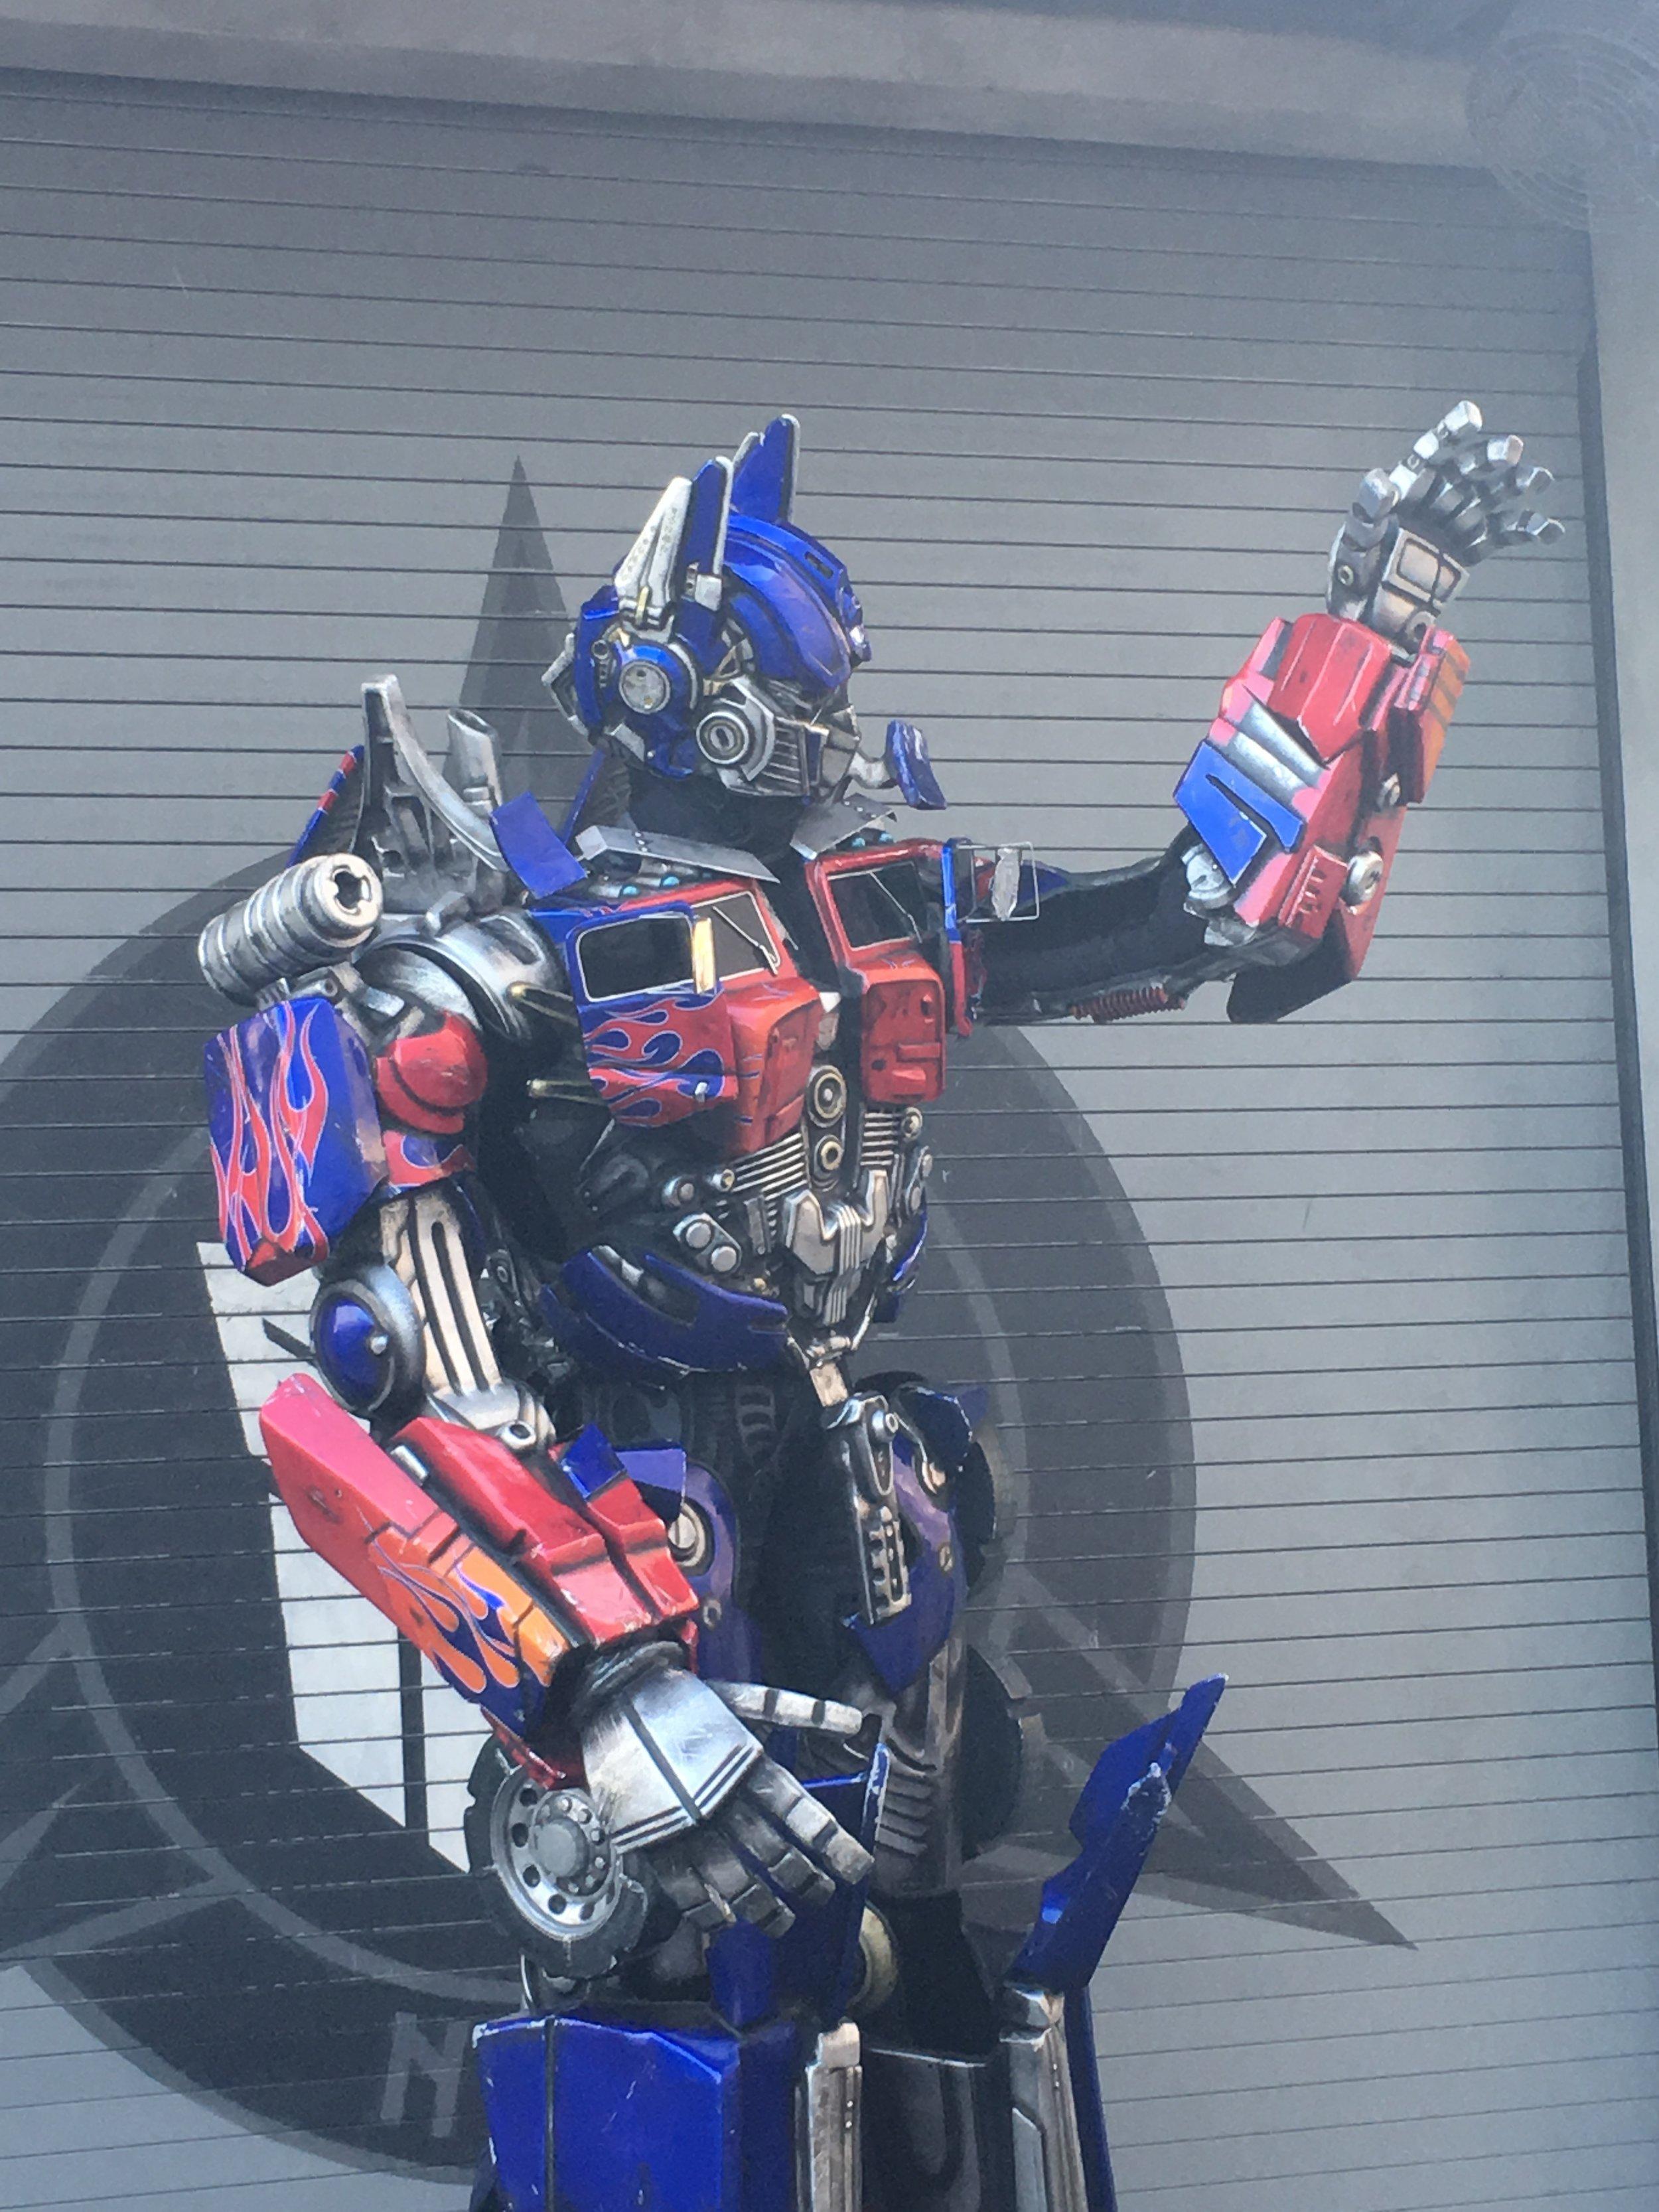 Wanderlust-blog-Universal-Orlando-VIP-Experience-Transformers